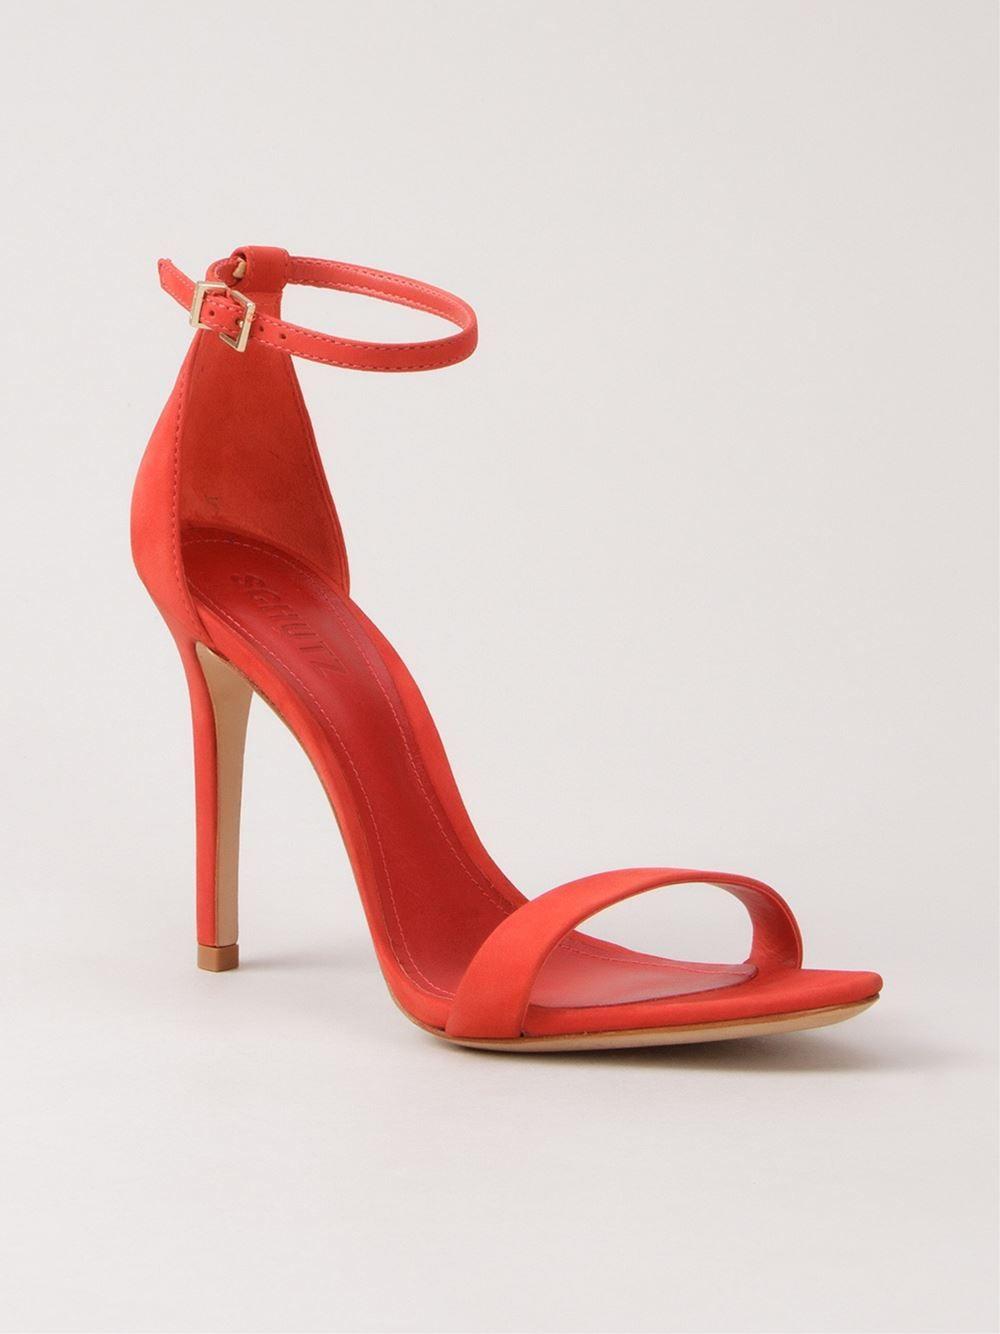 476d07a09f7a0 Schutz Sandália De Nobuck - Schutz - Farfetch.com   Shoes   Bags ...